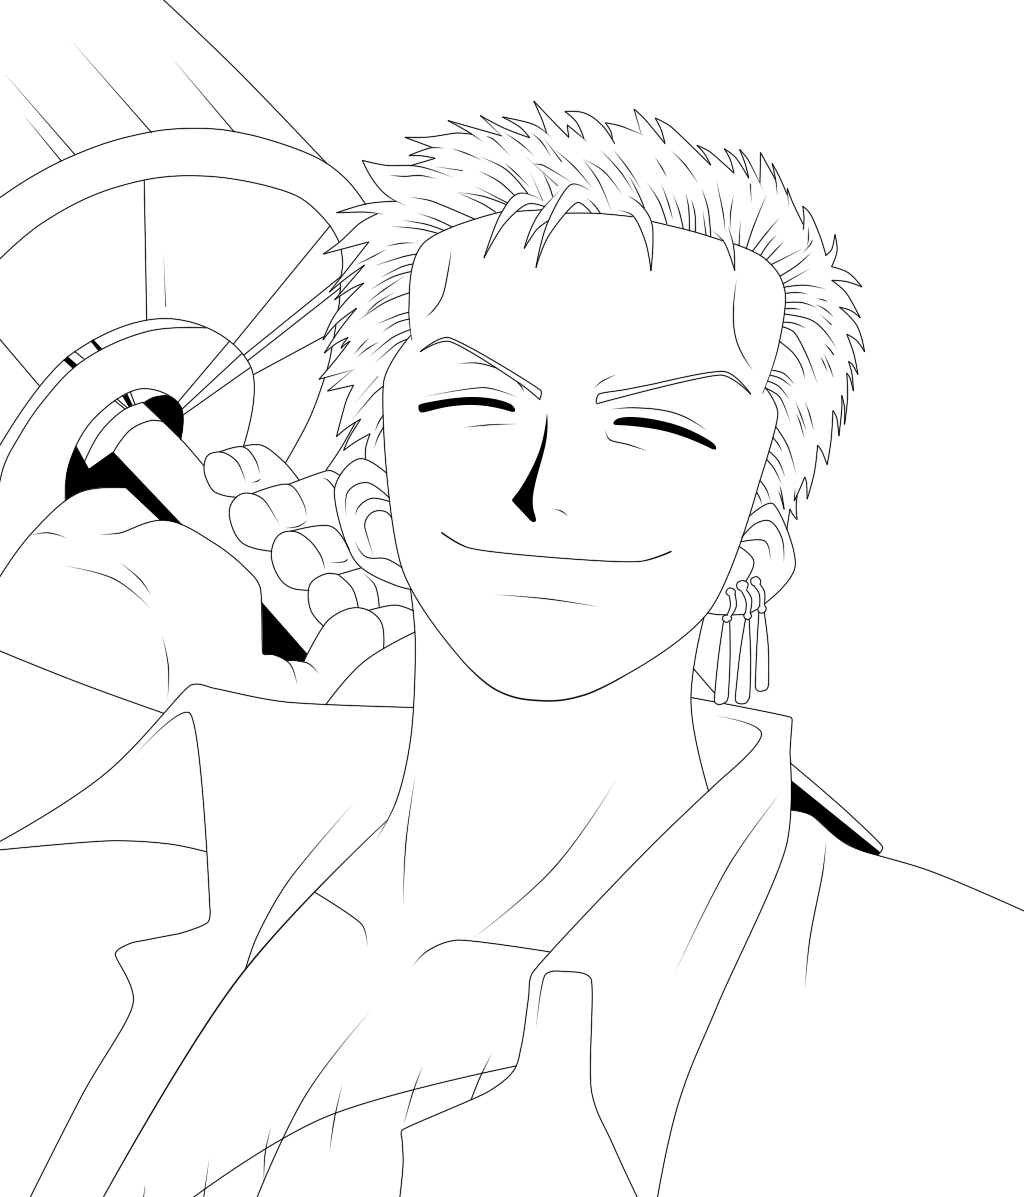 Zoro Lineart : Roronoa zoro lineart by scarletft on deviantart